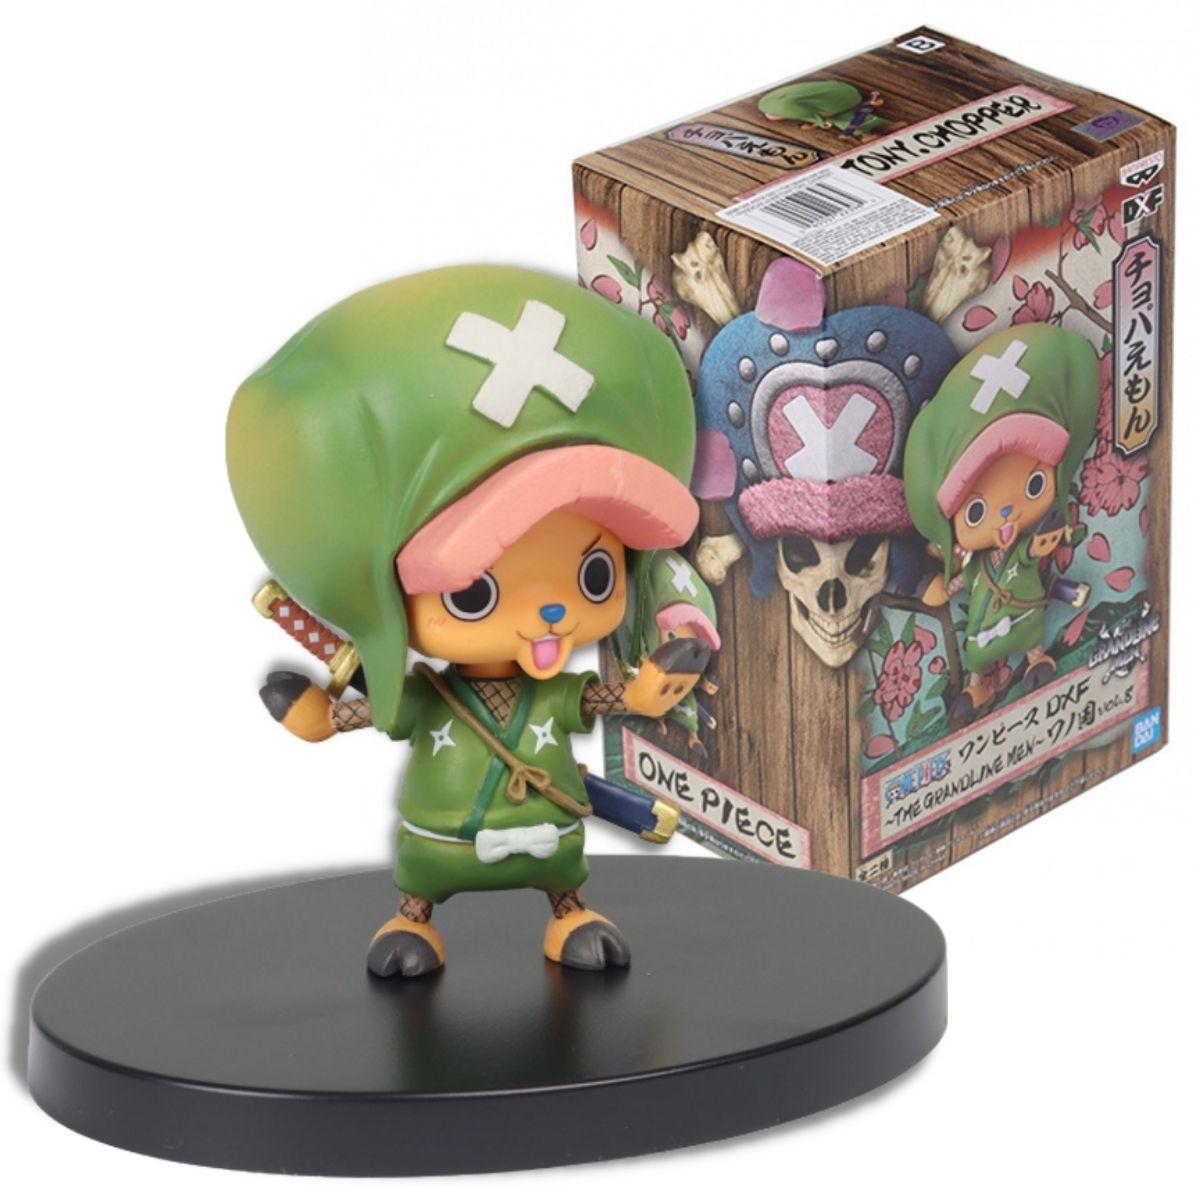 Boneco Chopper - One Piece The Grandline Men Vol 8 - Bandai